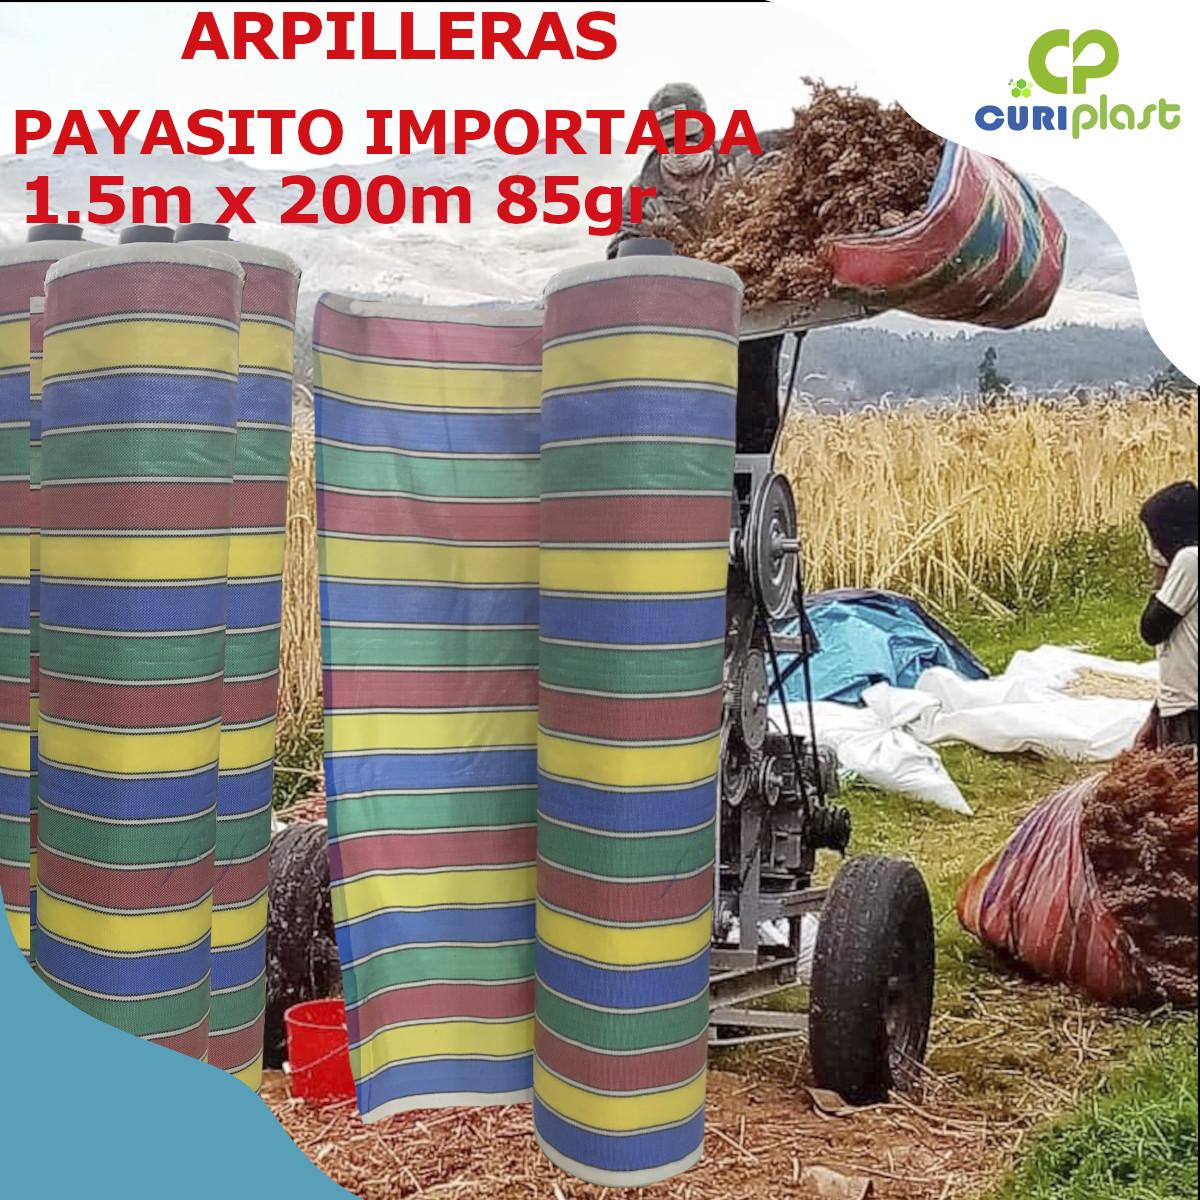 Arpillera payasito importada de 1.5m